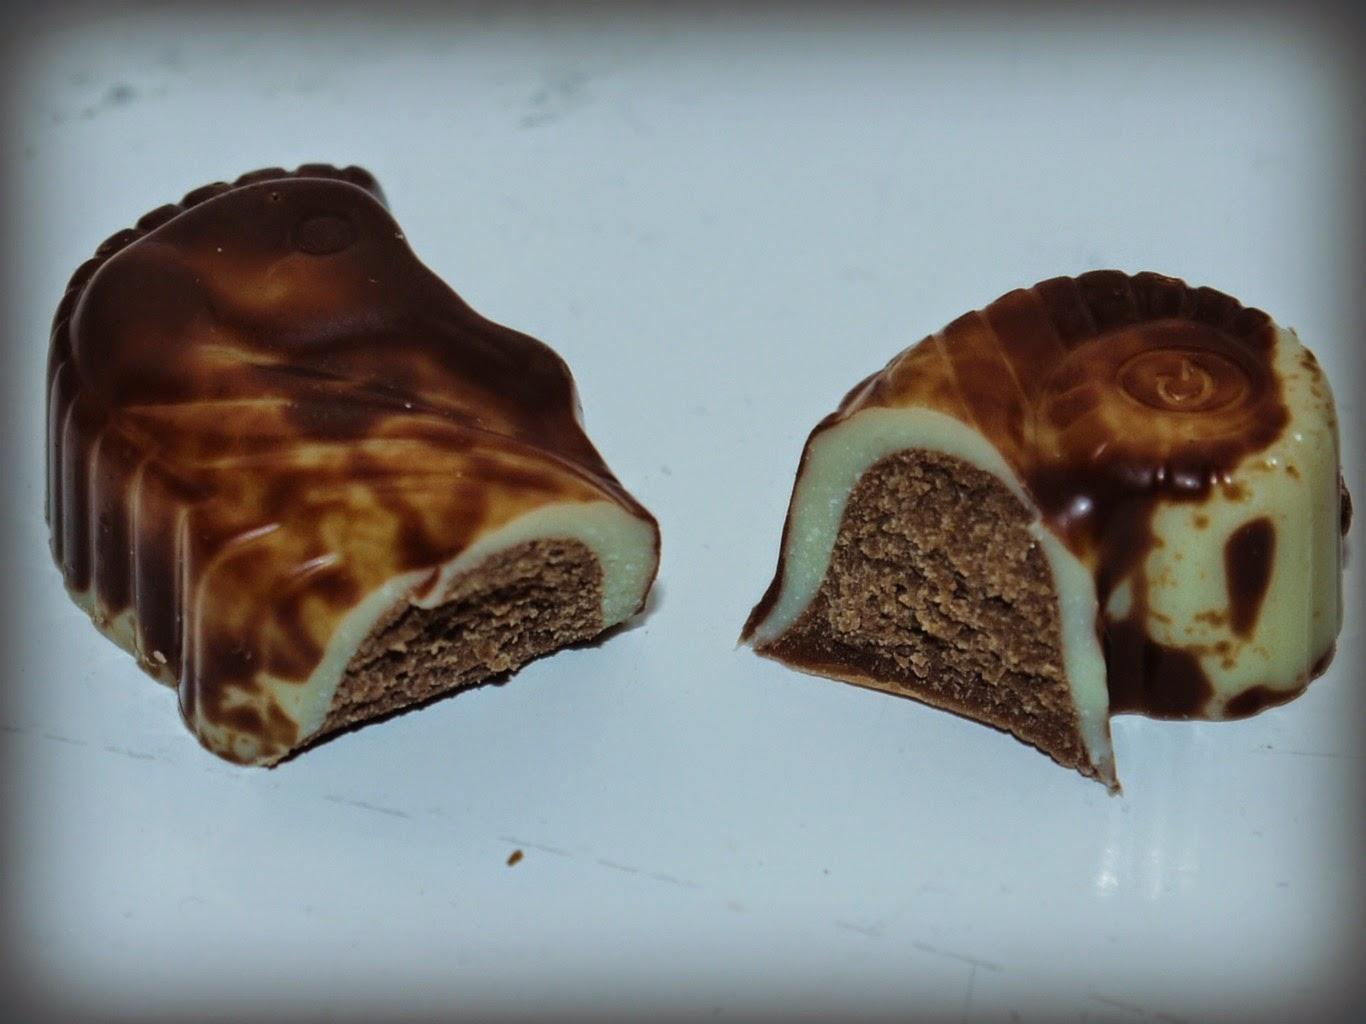 guylian seahorse, chocolate